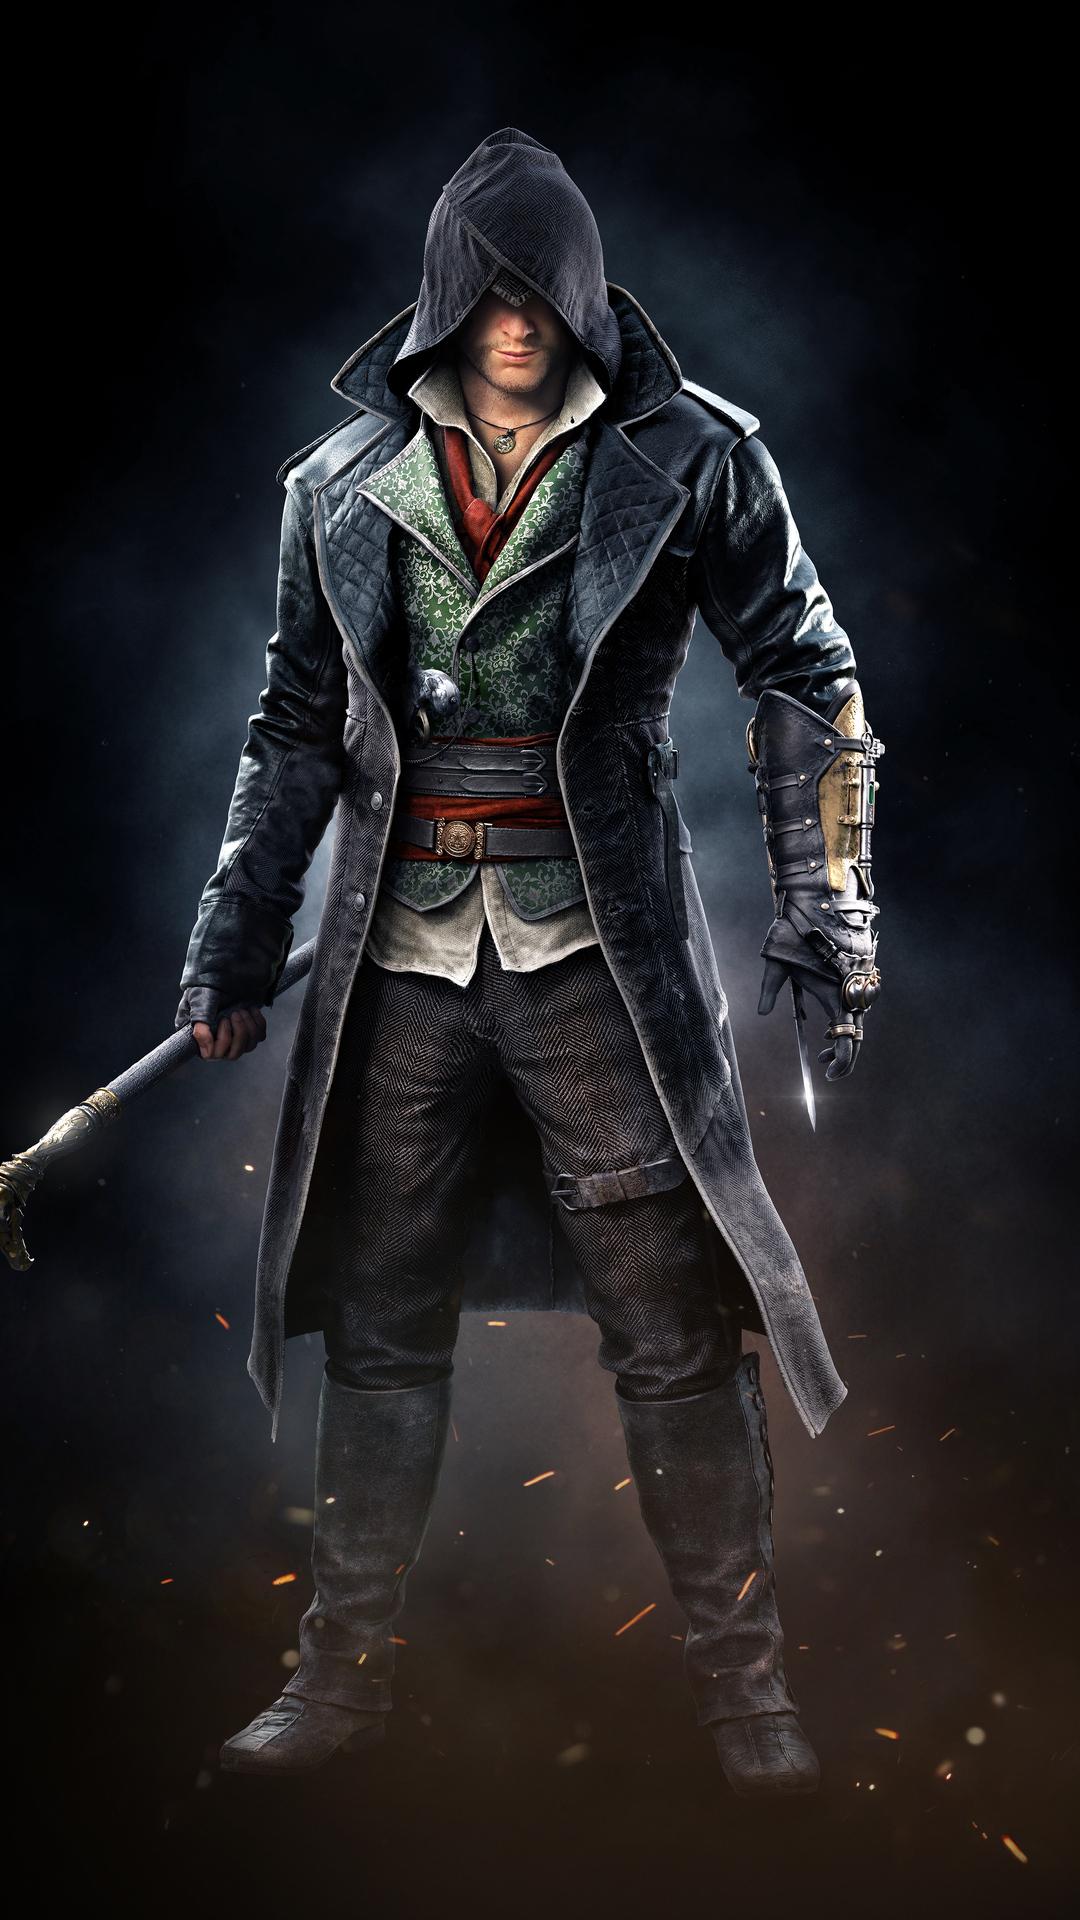 2019-assassins-creed-syndicate-game-8k-qu.jpg